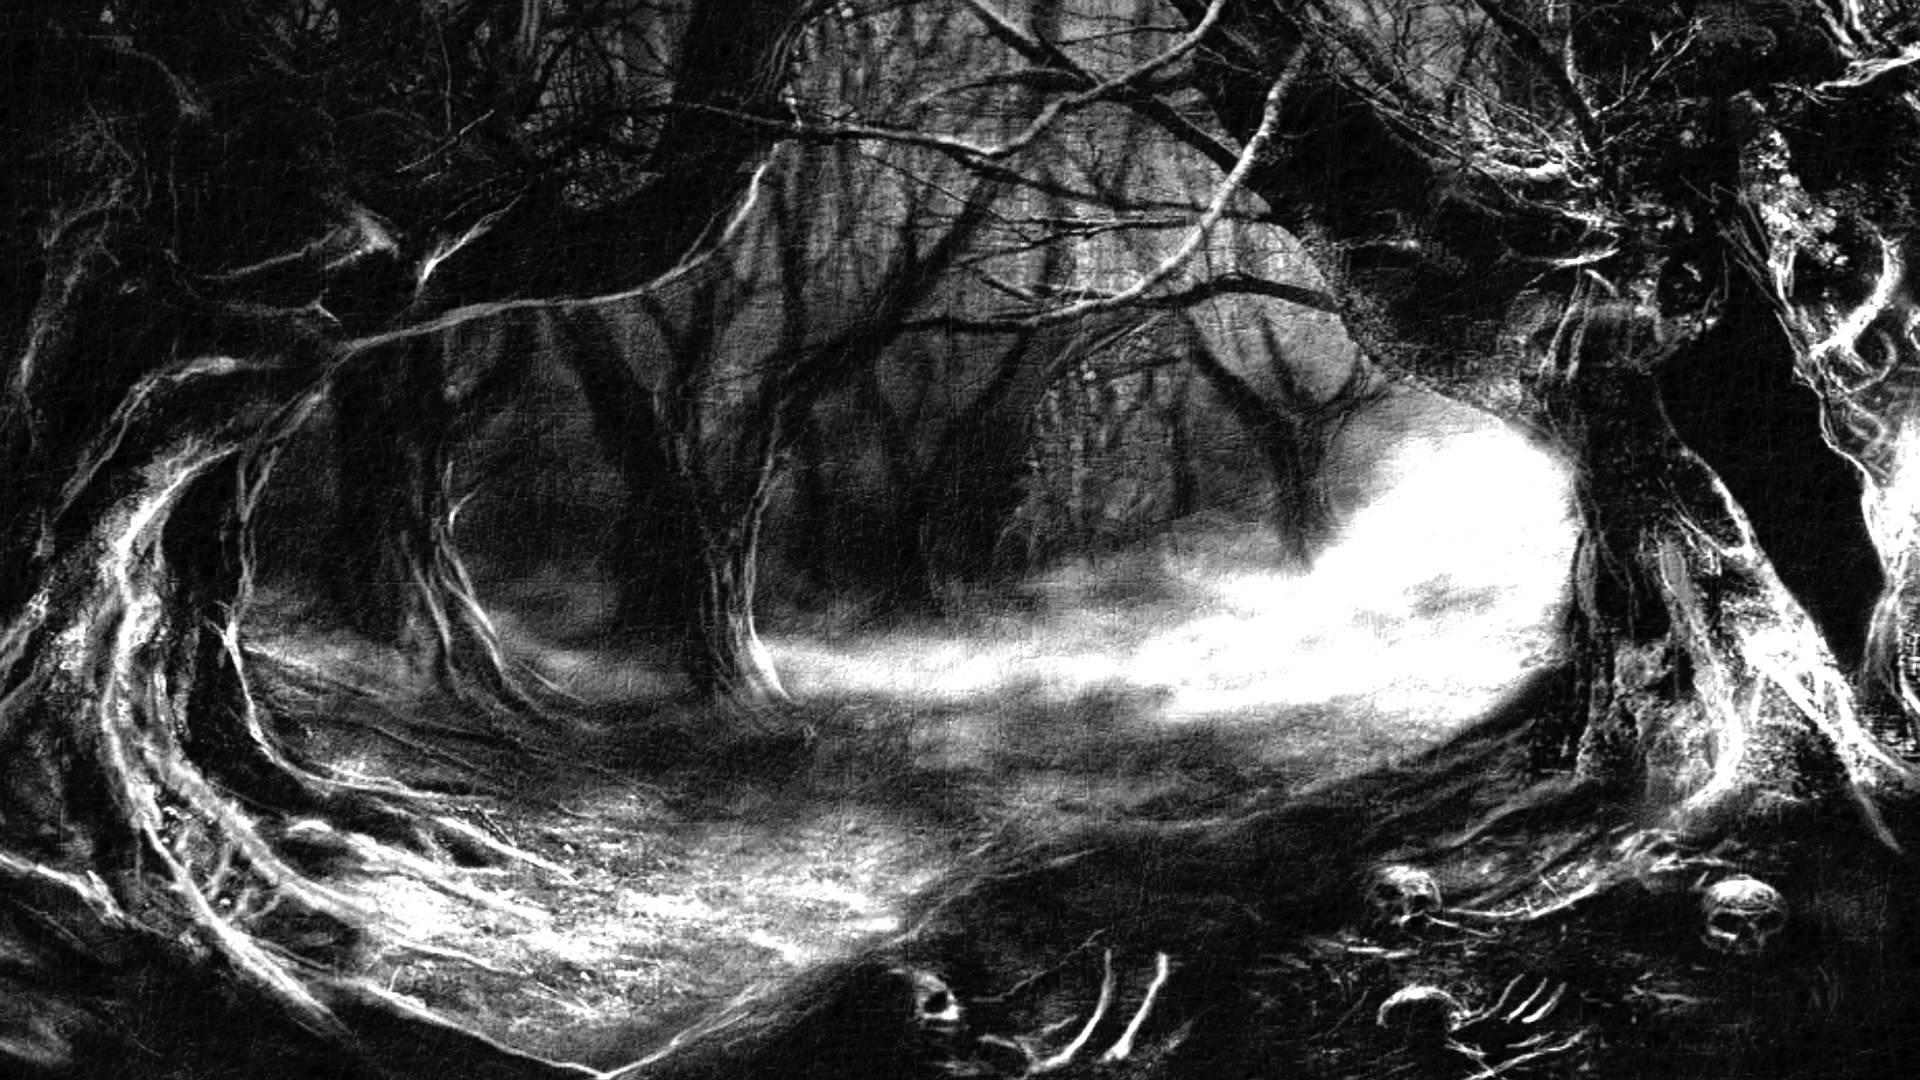 1920x1080 Wallpapers For Depressive Suicidal Black Metal Wallpaper